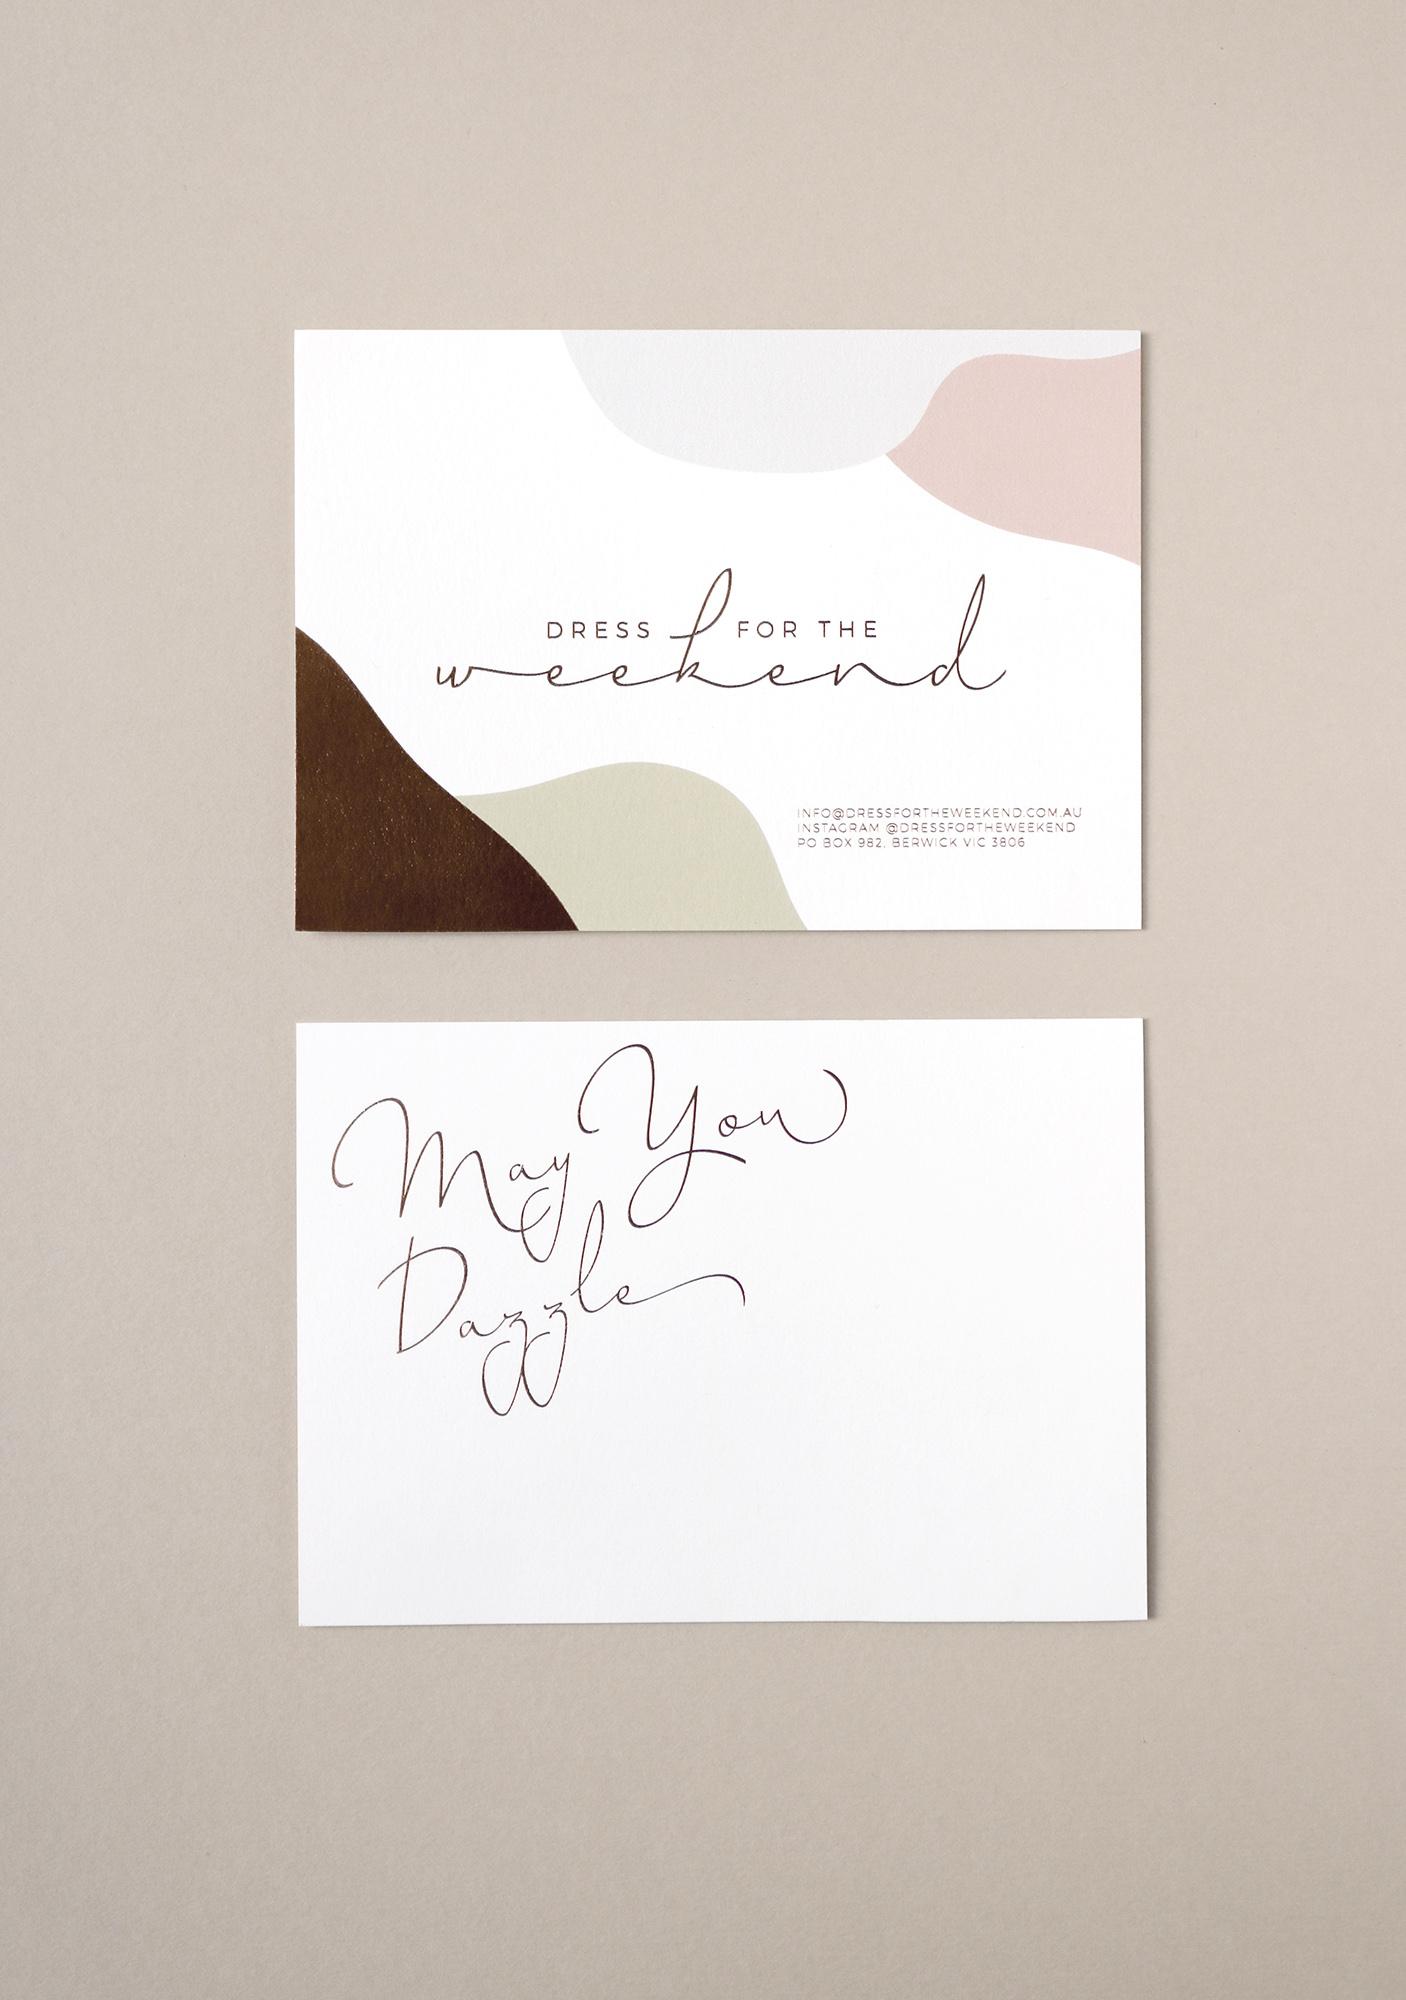 DFTW Thank You Card Design + Copper Foil